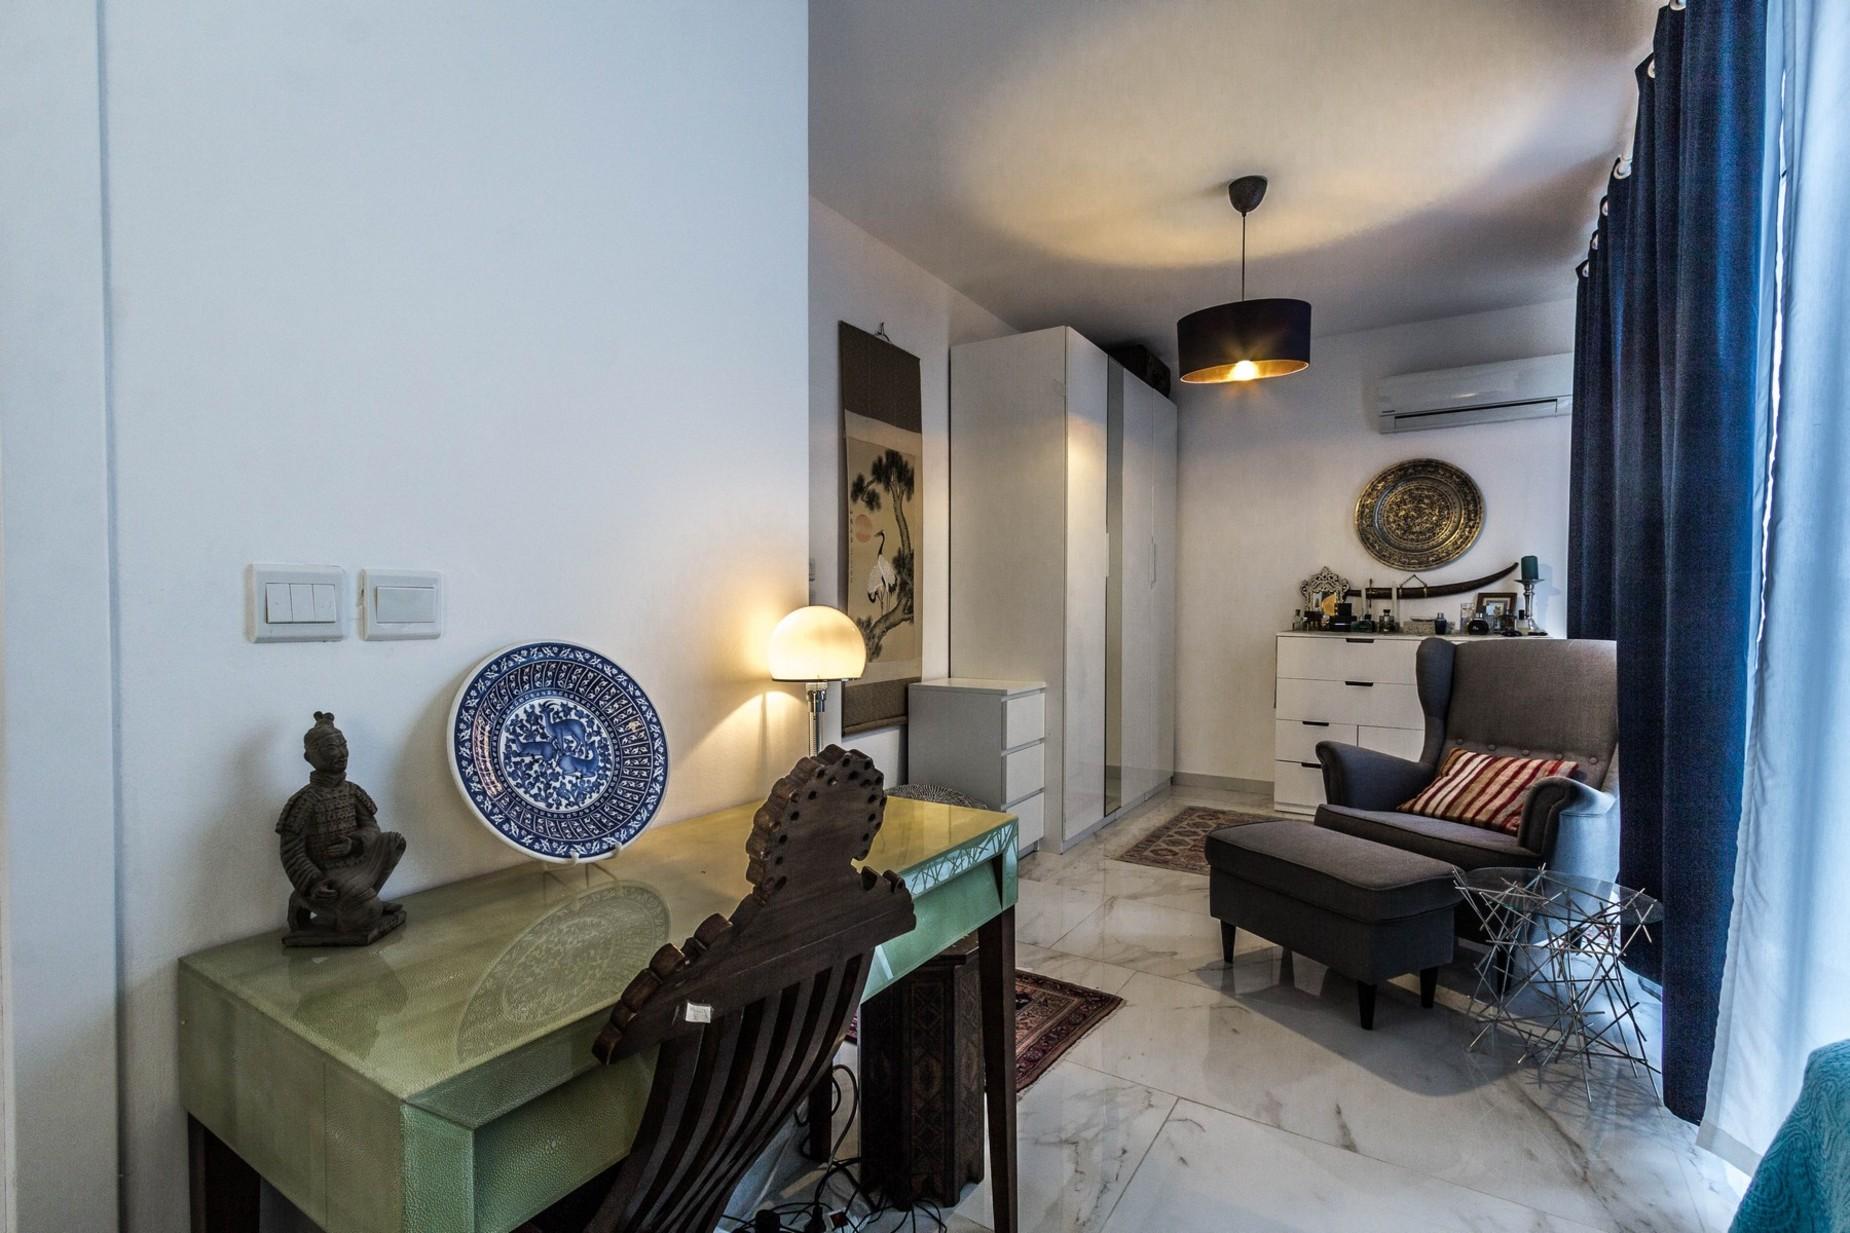 2 bed Penthouse For Sale in Pieta, Pieta - thumb 8